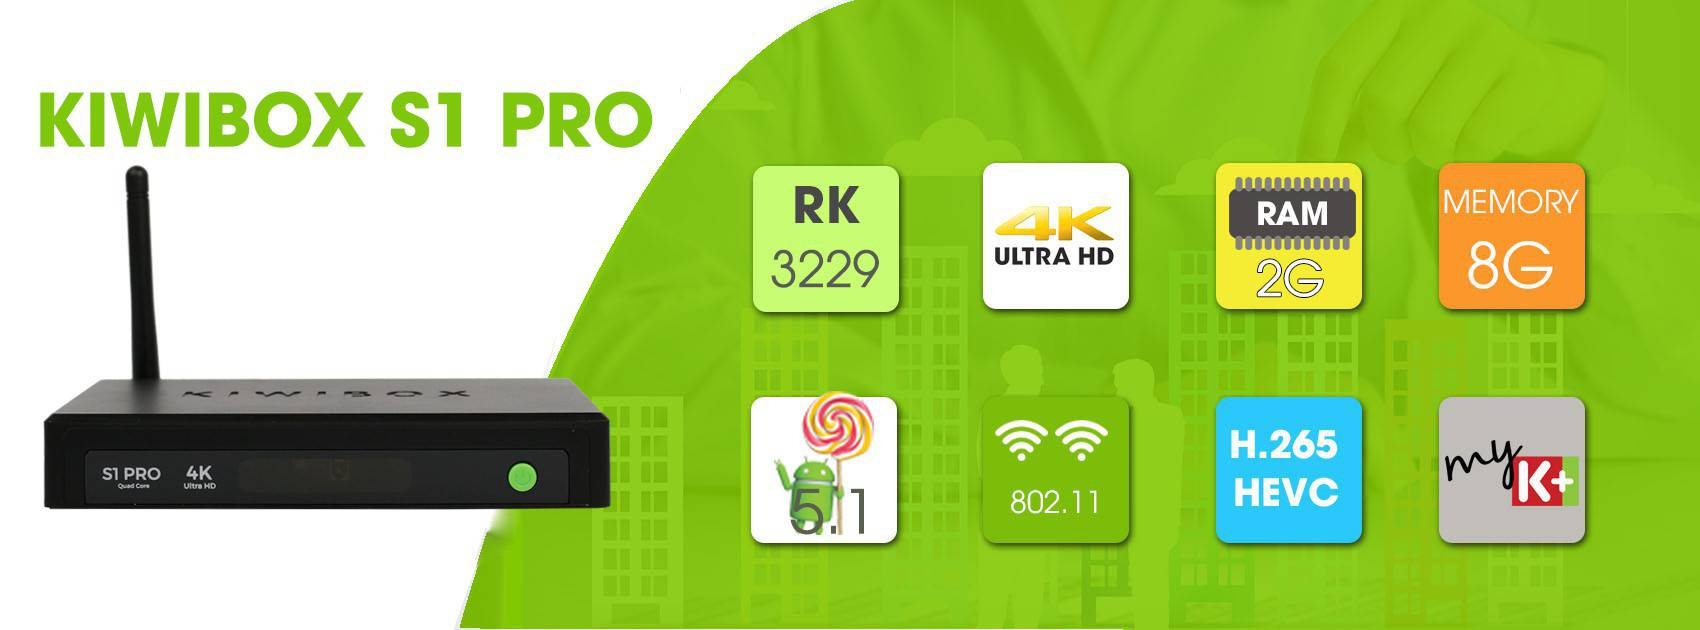 Kiwibox S1 Pro – Android 5.1, RAM 2G